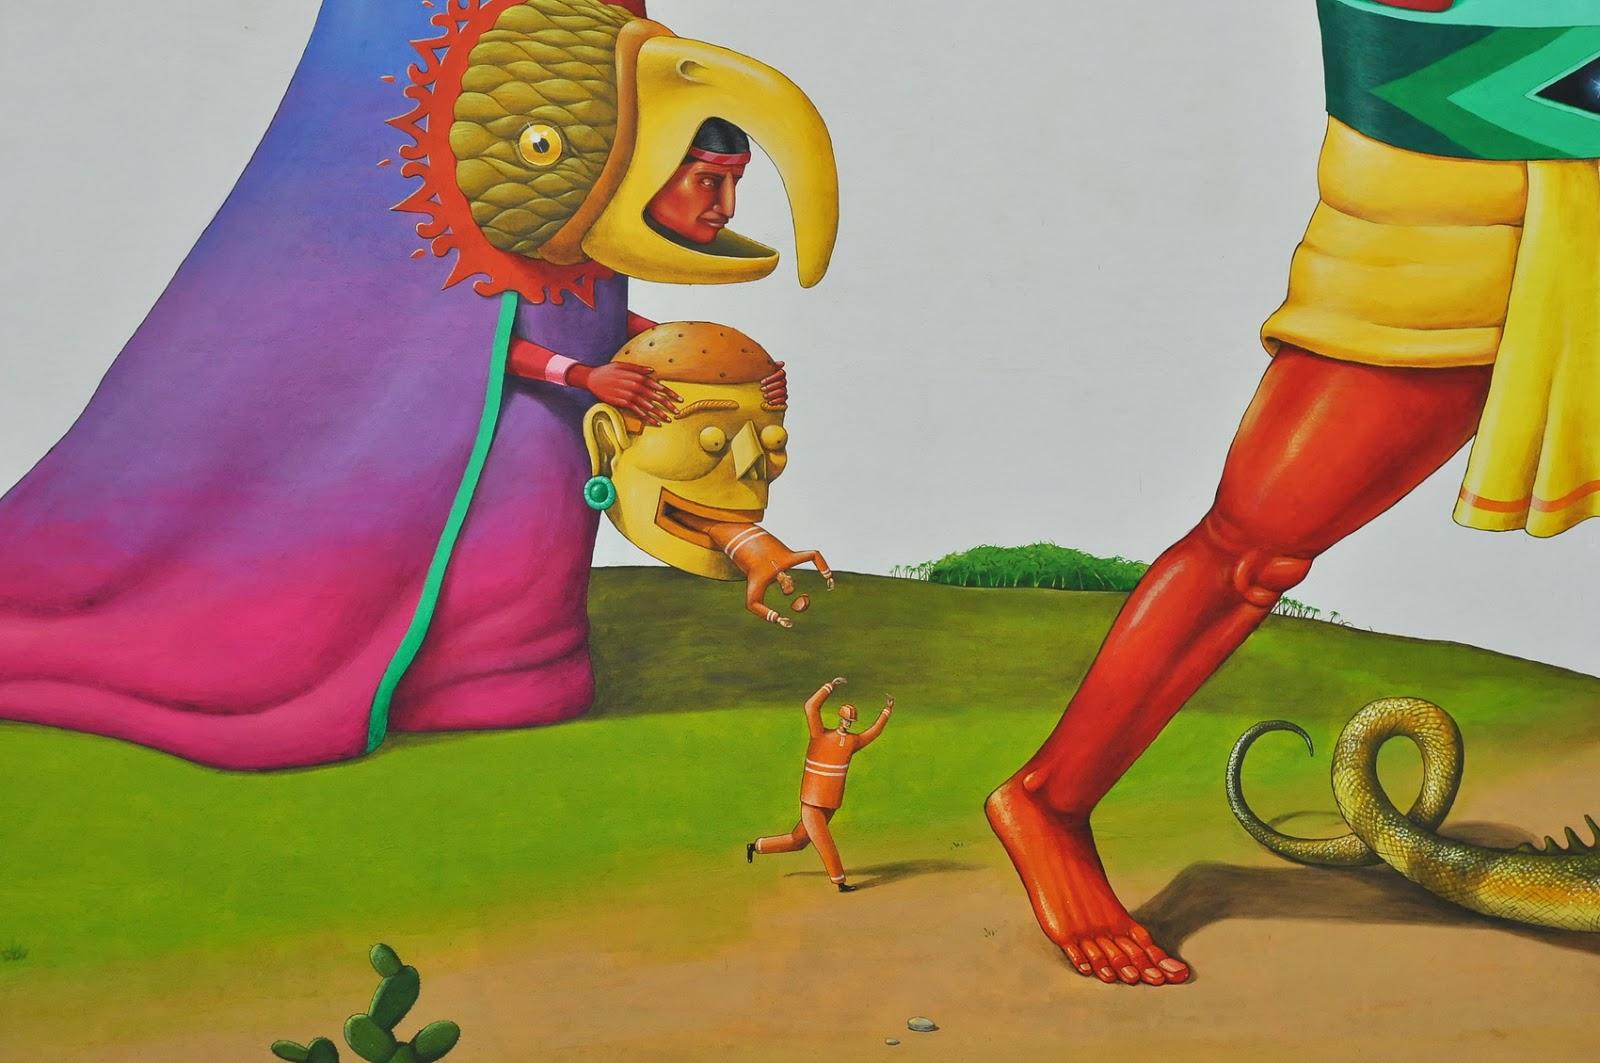 interesni-kazki-new-mural-campeche-mexico-16